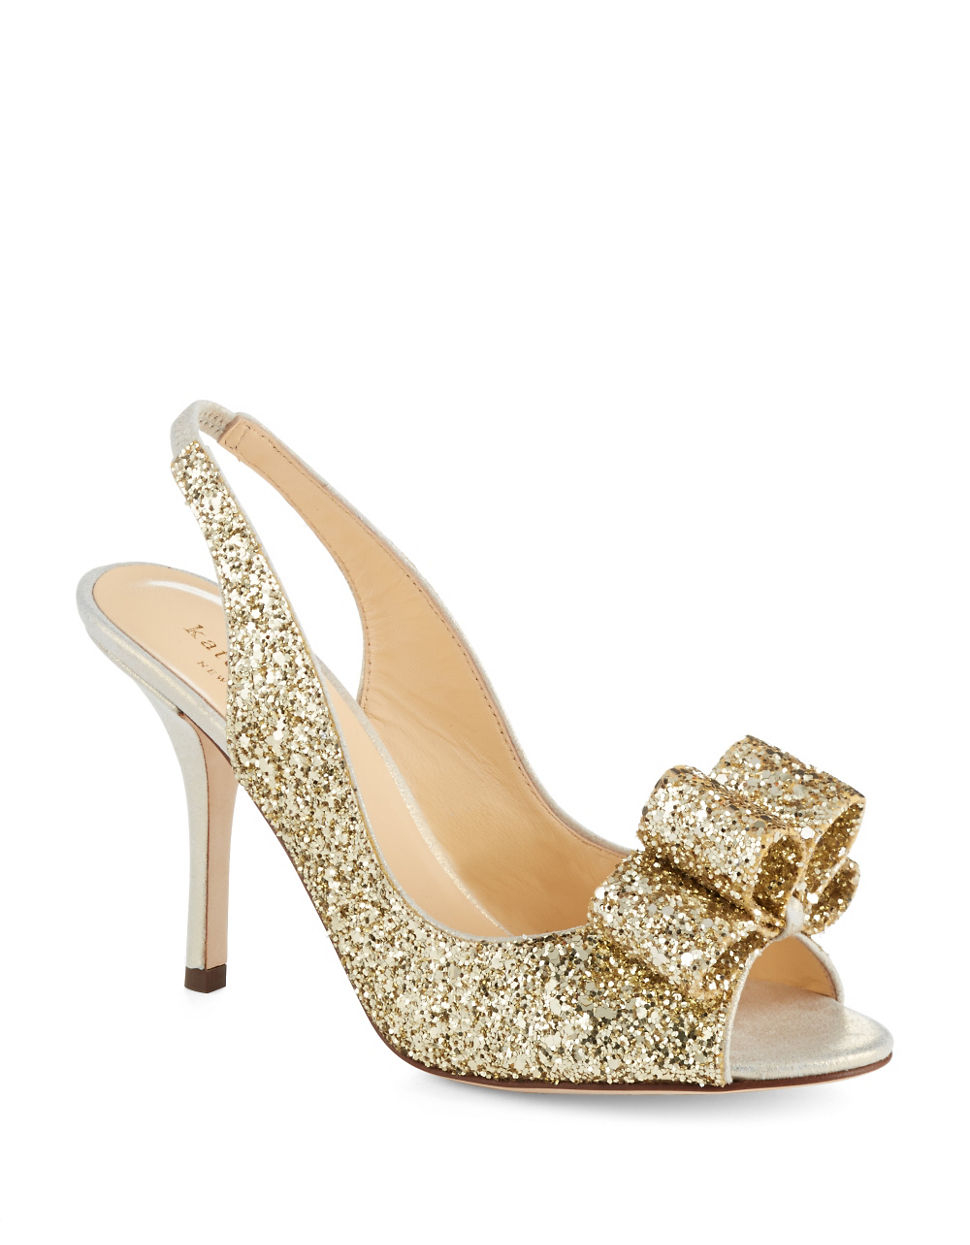 kate spade charm glitter heels in gold gold glitter lyst